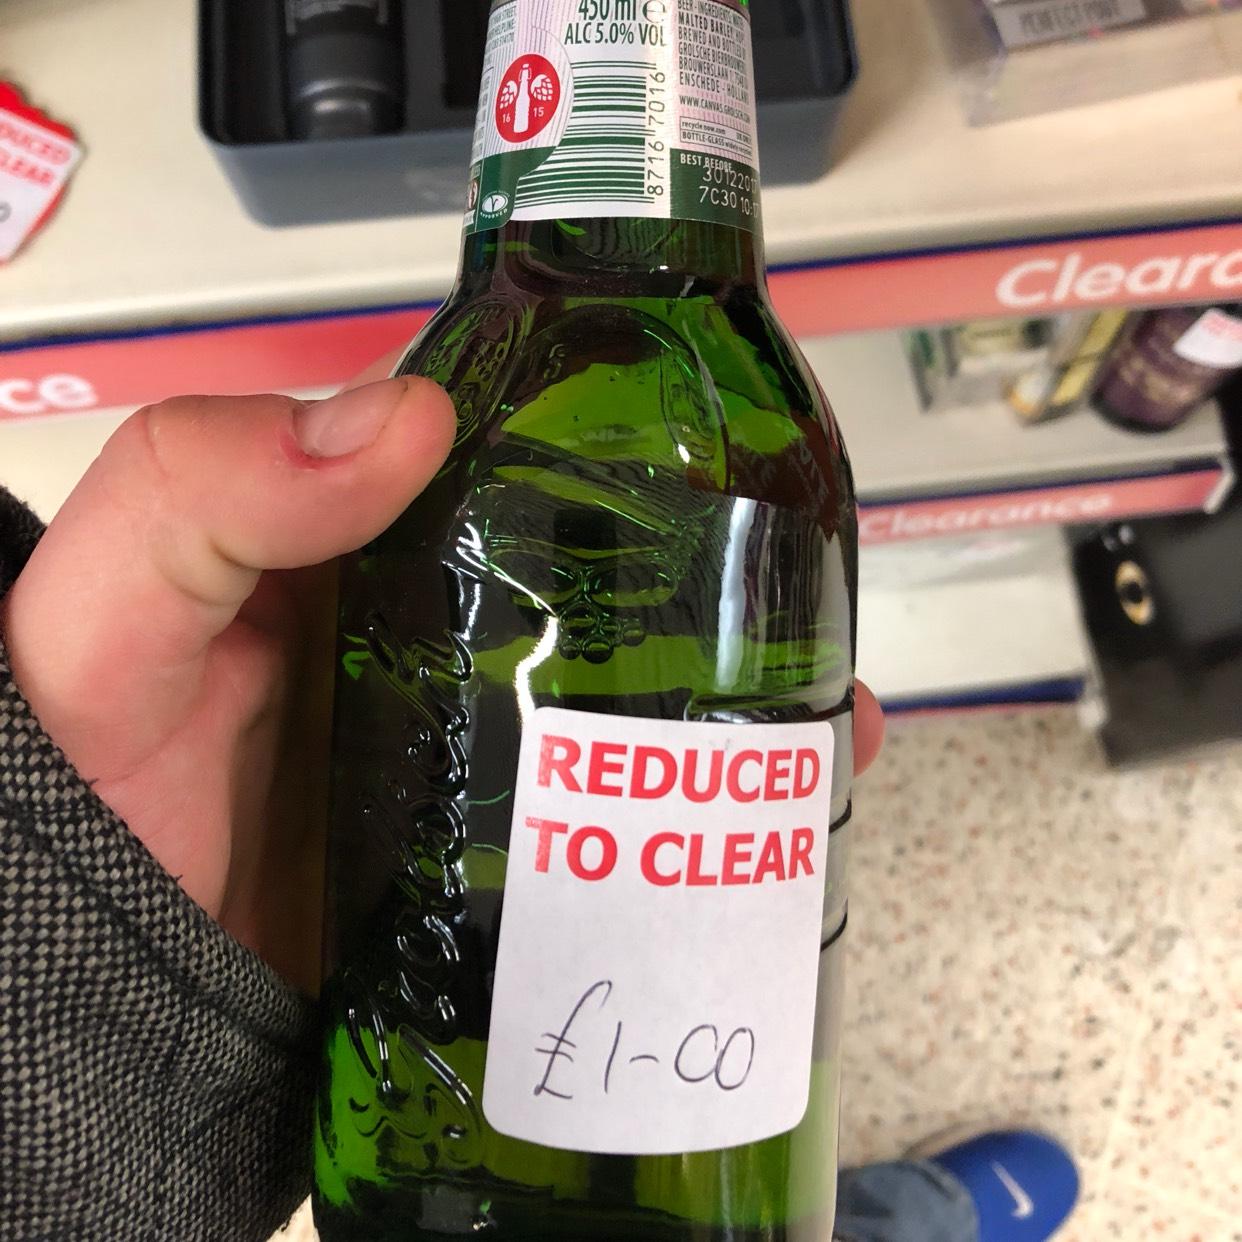 Grolsh (bottles useful for Homebrew!) £1 in B&M